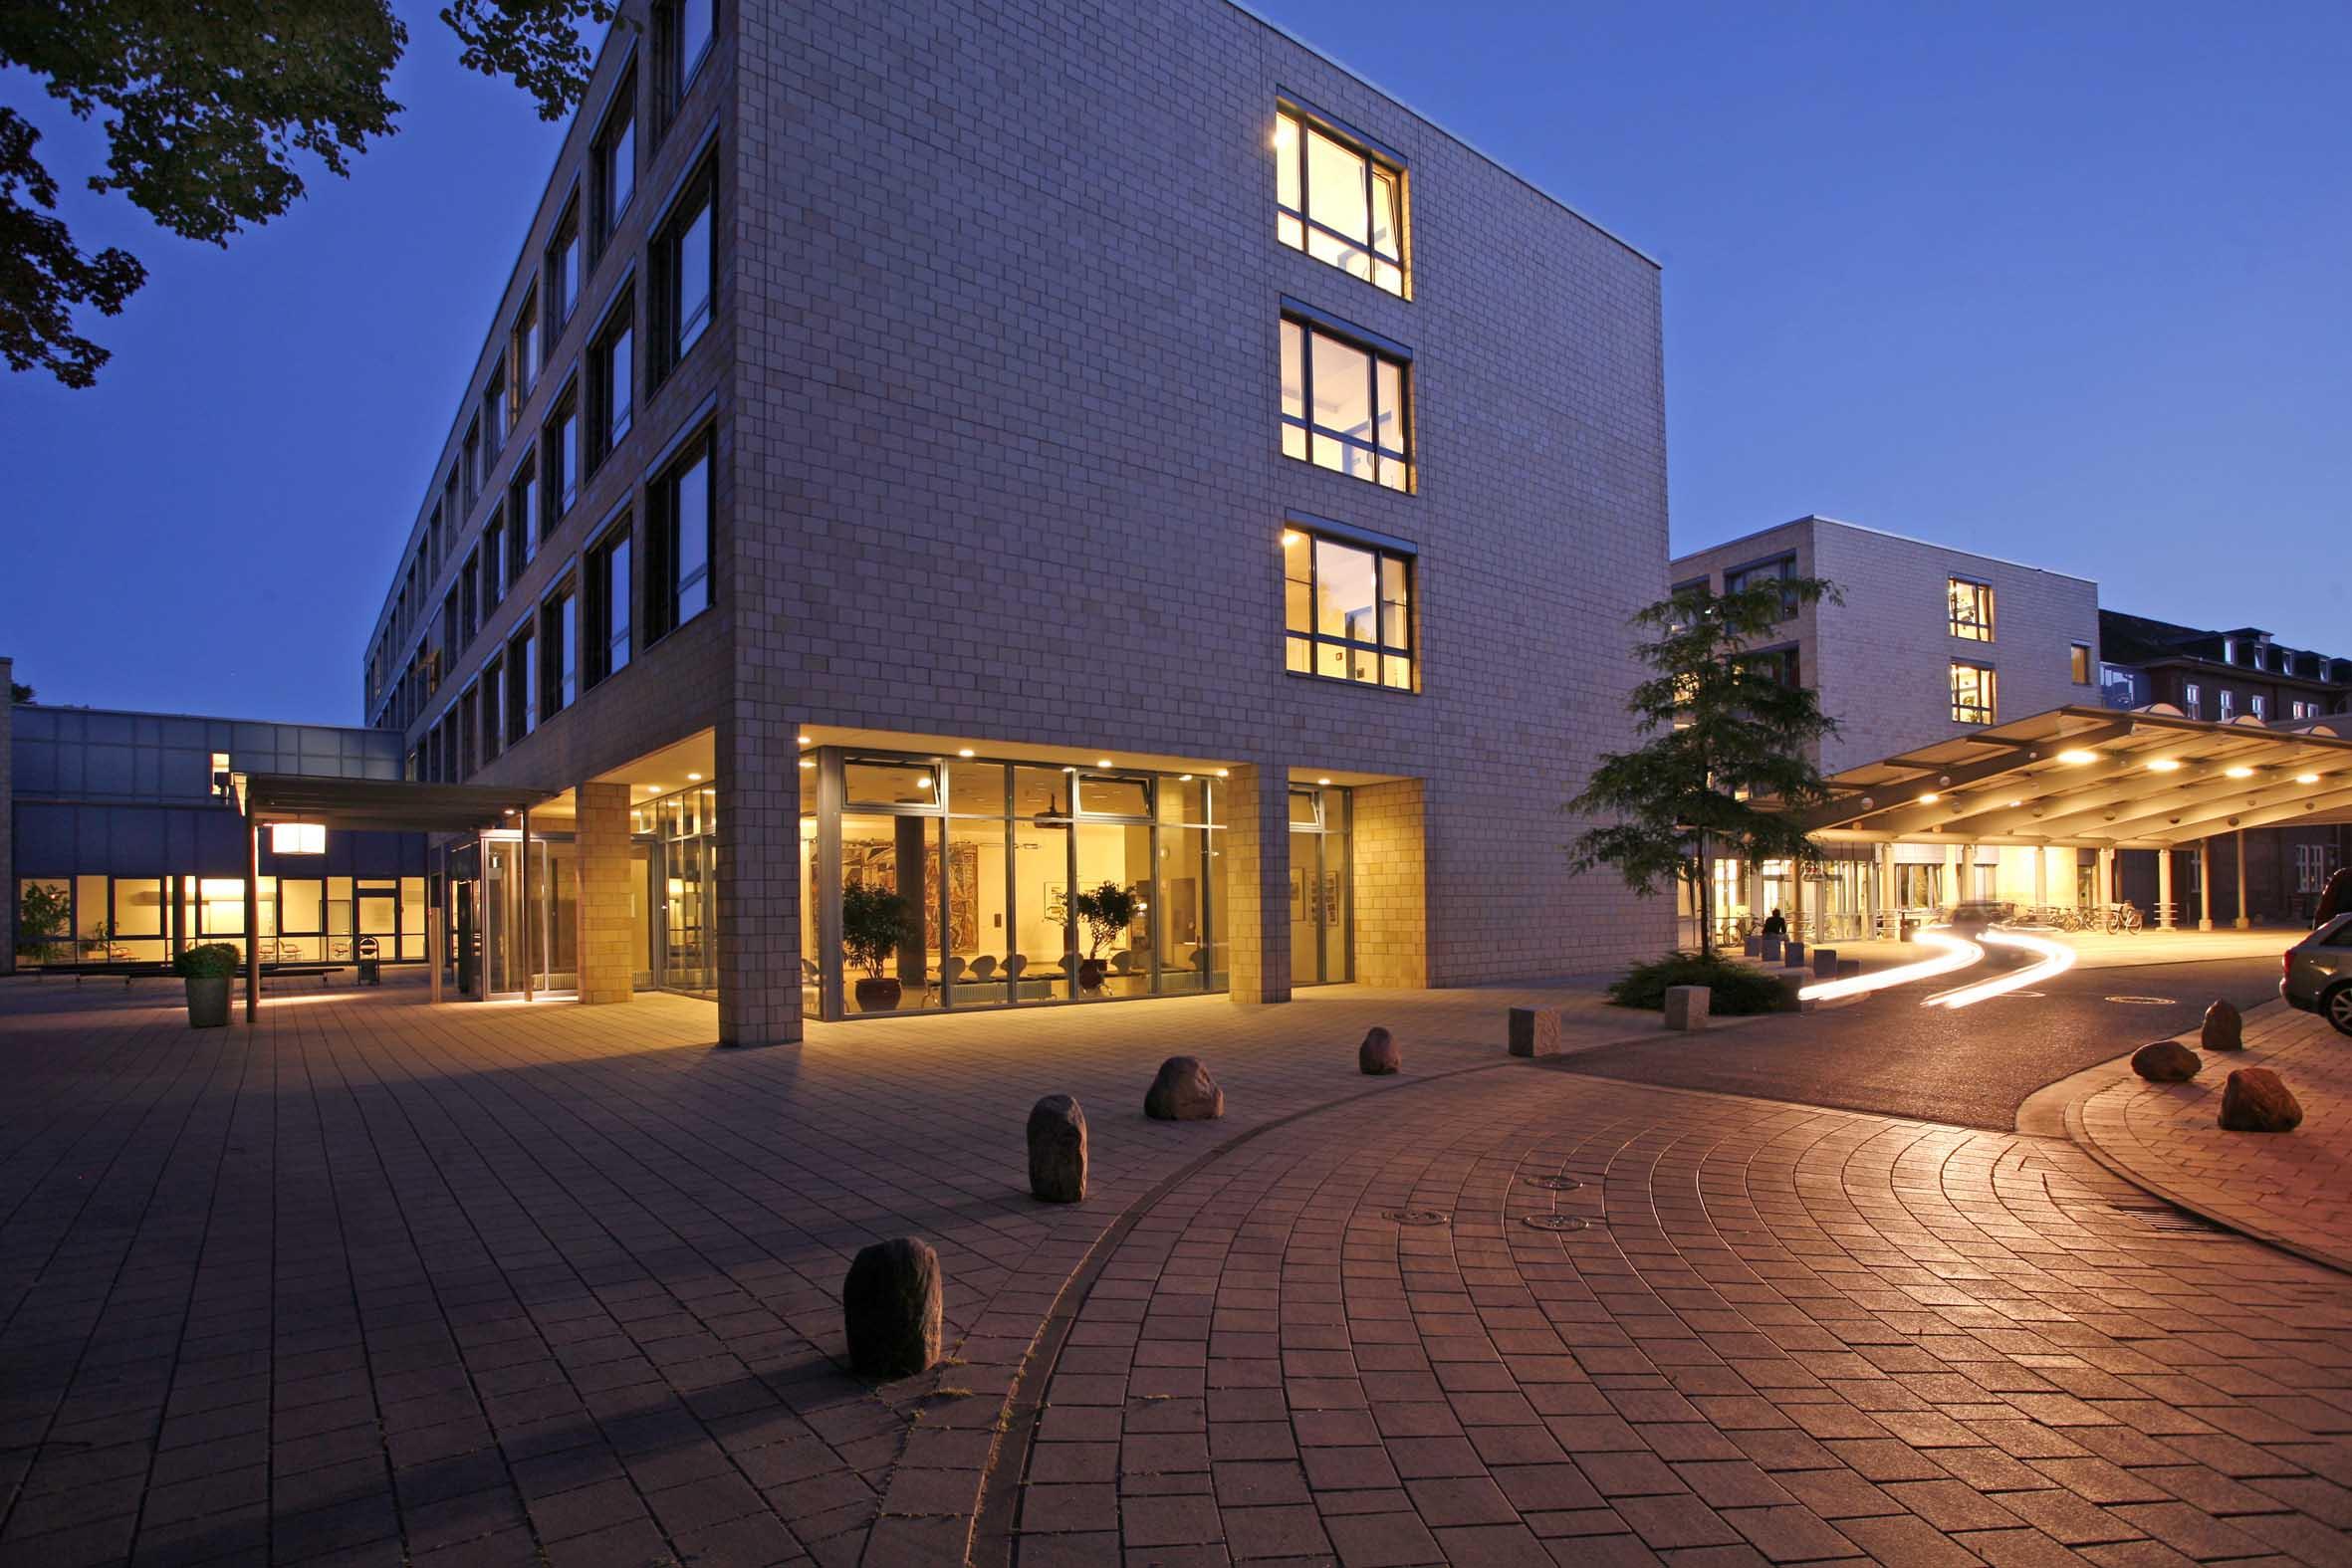 Eilbek Krankenhaus Hamburg